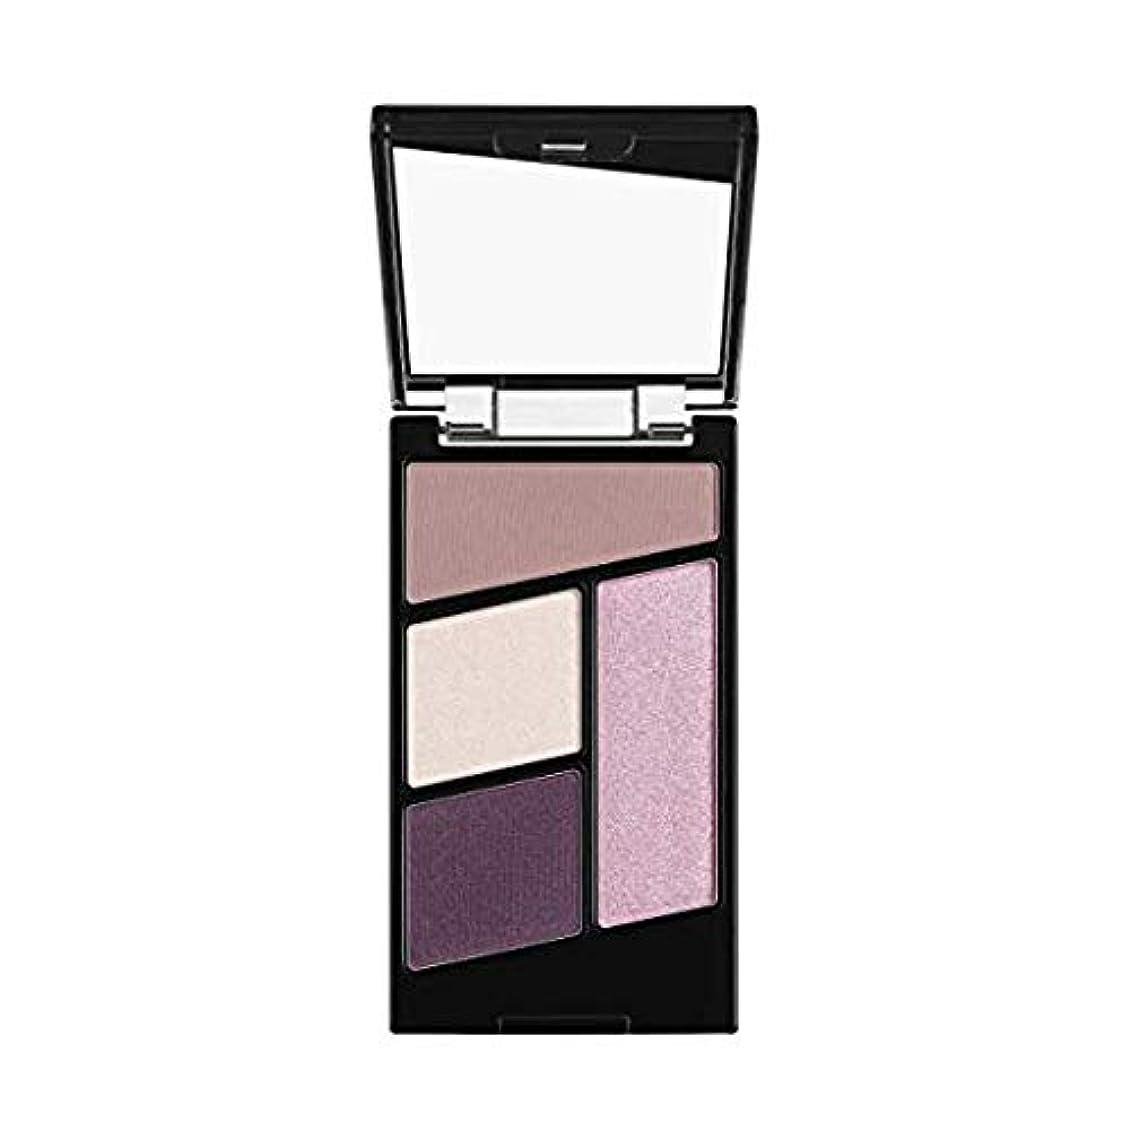 WET N WILD Color Icon Eyeshadow Quad - Petalette (並行輸入品)